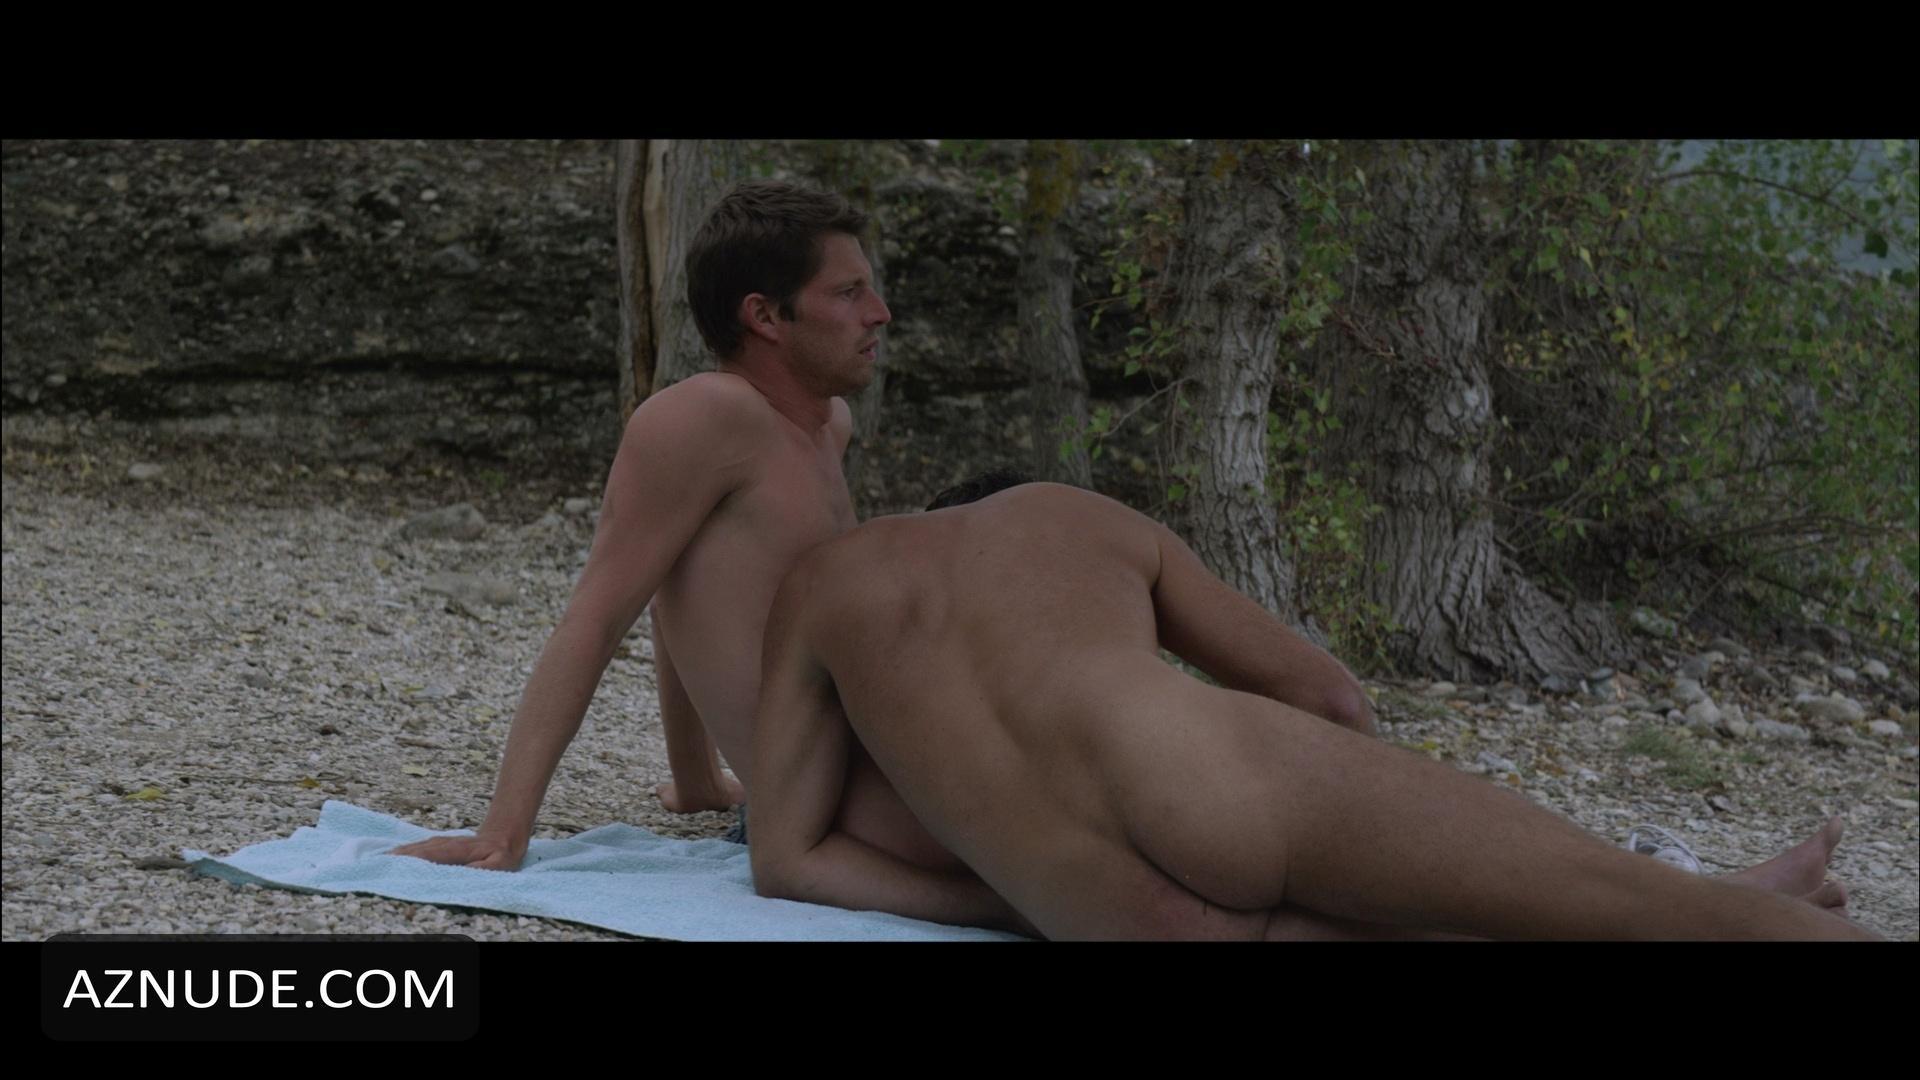 CHRISTOPHE PAOU Nude  AZNude Men